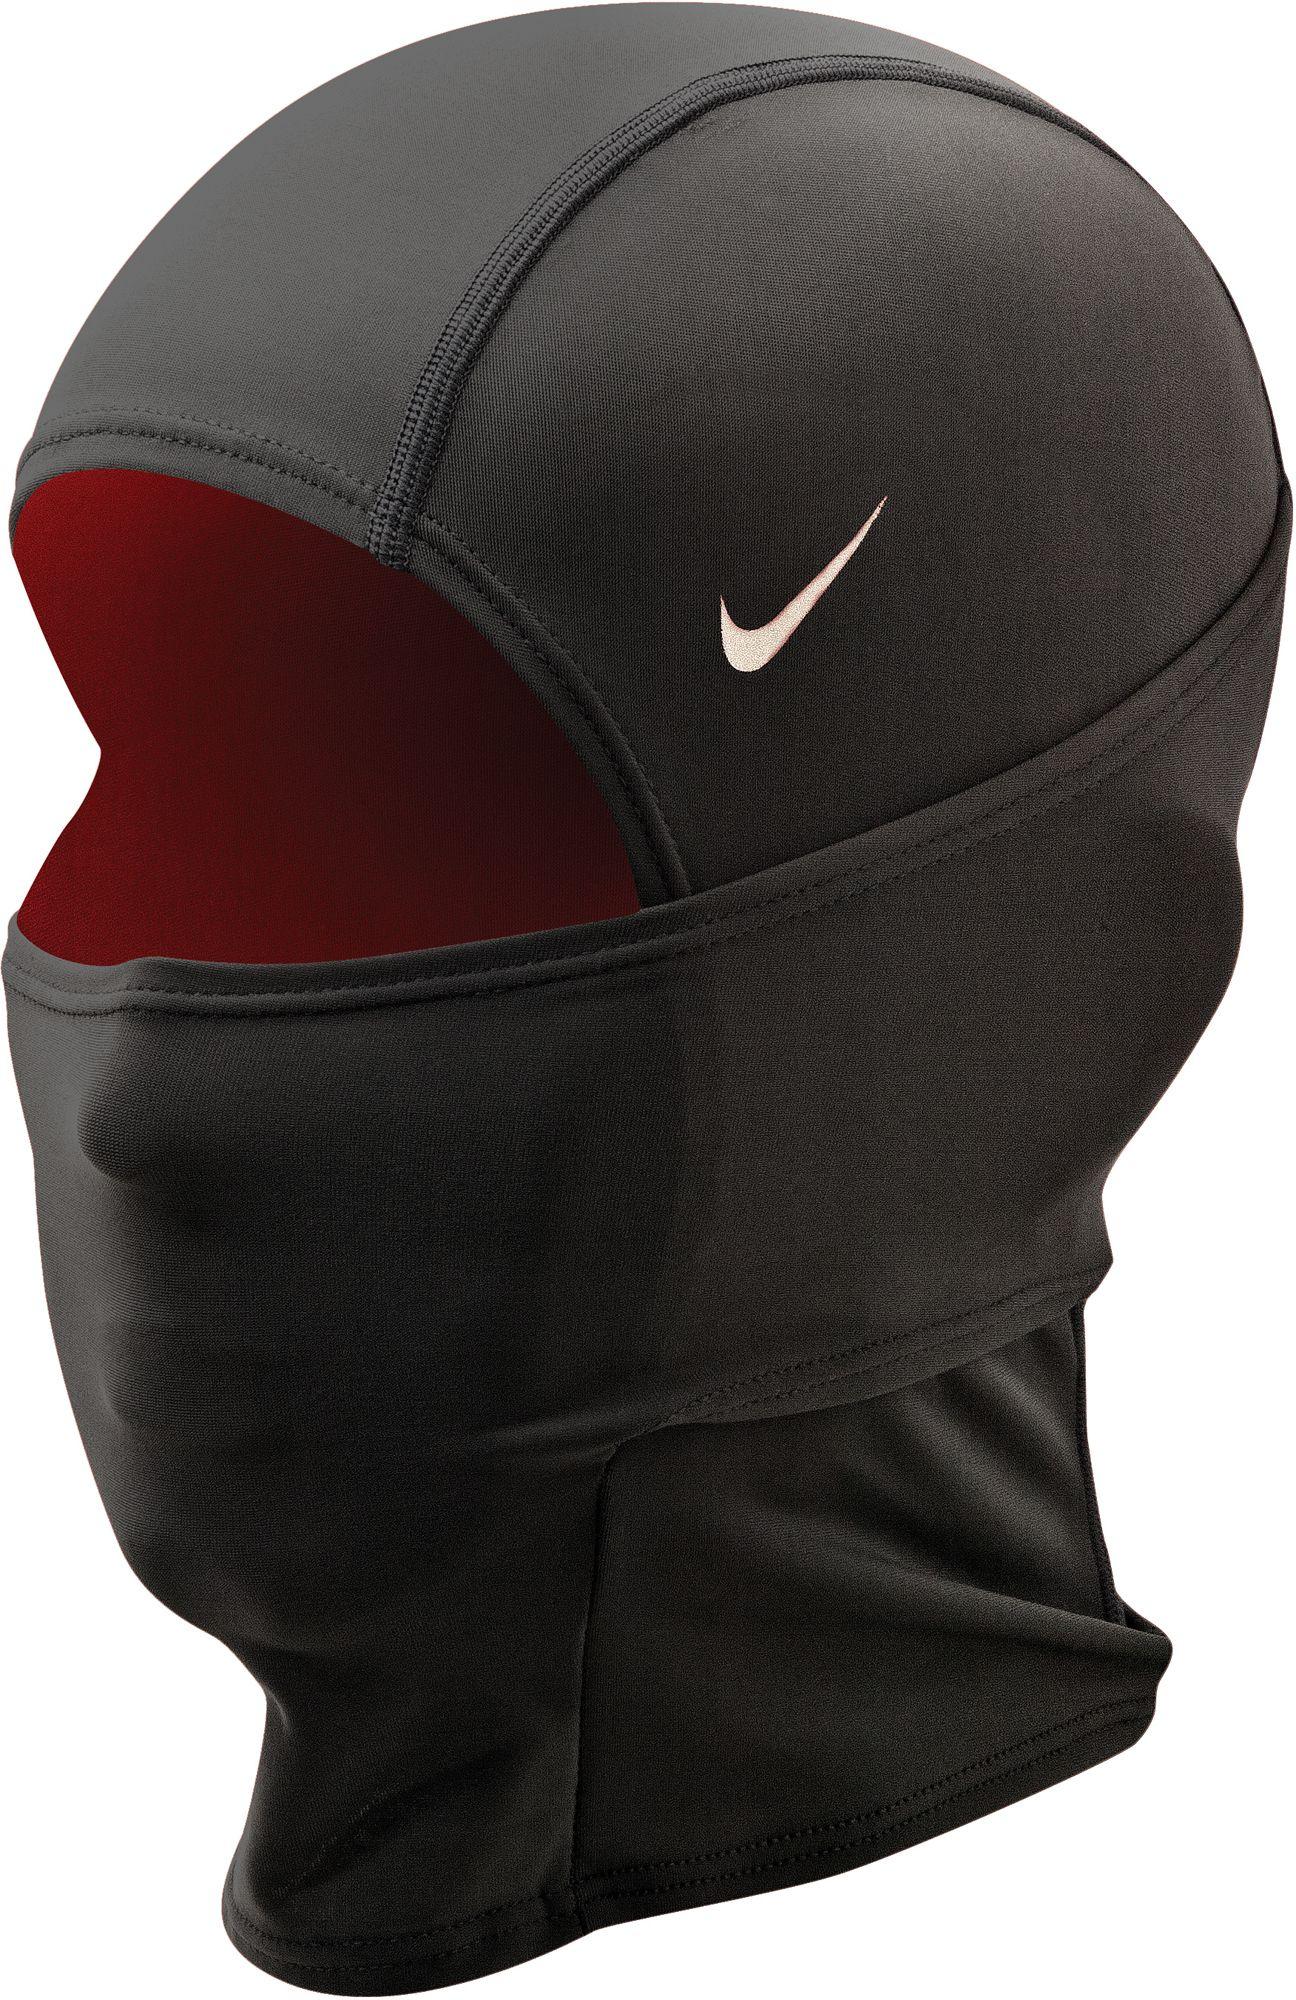 Black Nike Running Ski Mask